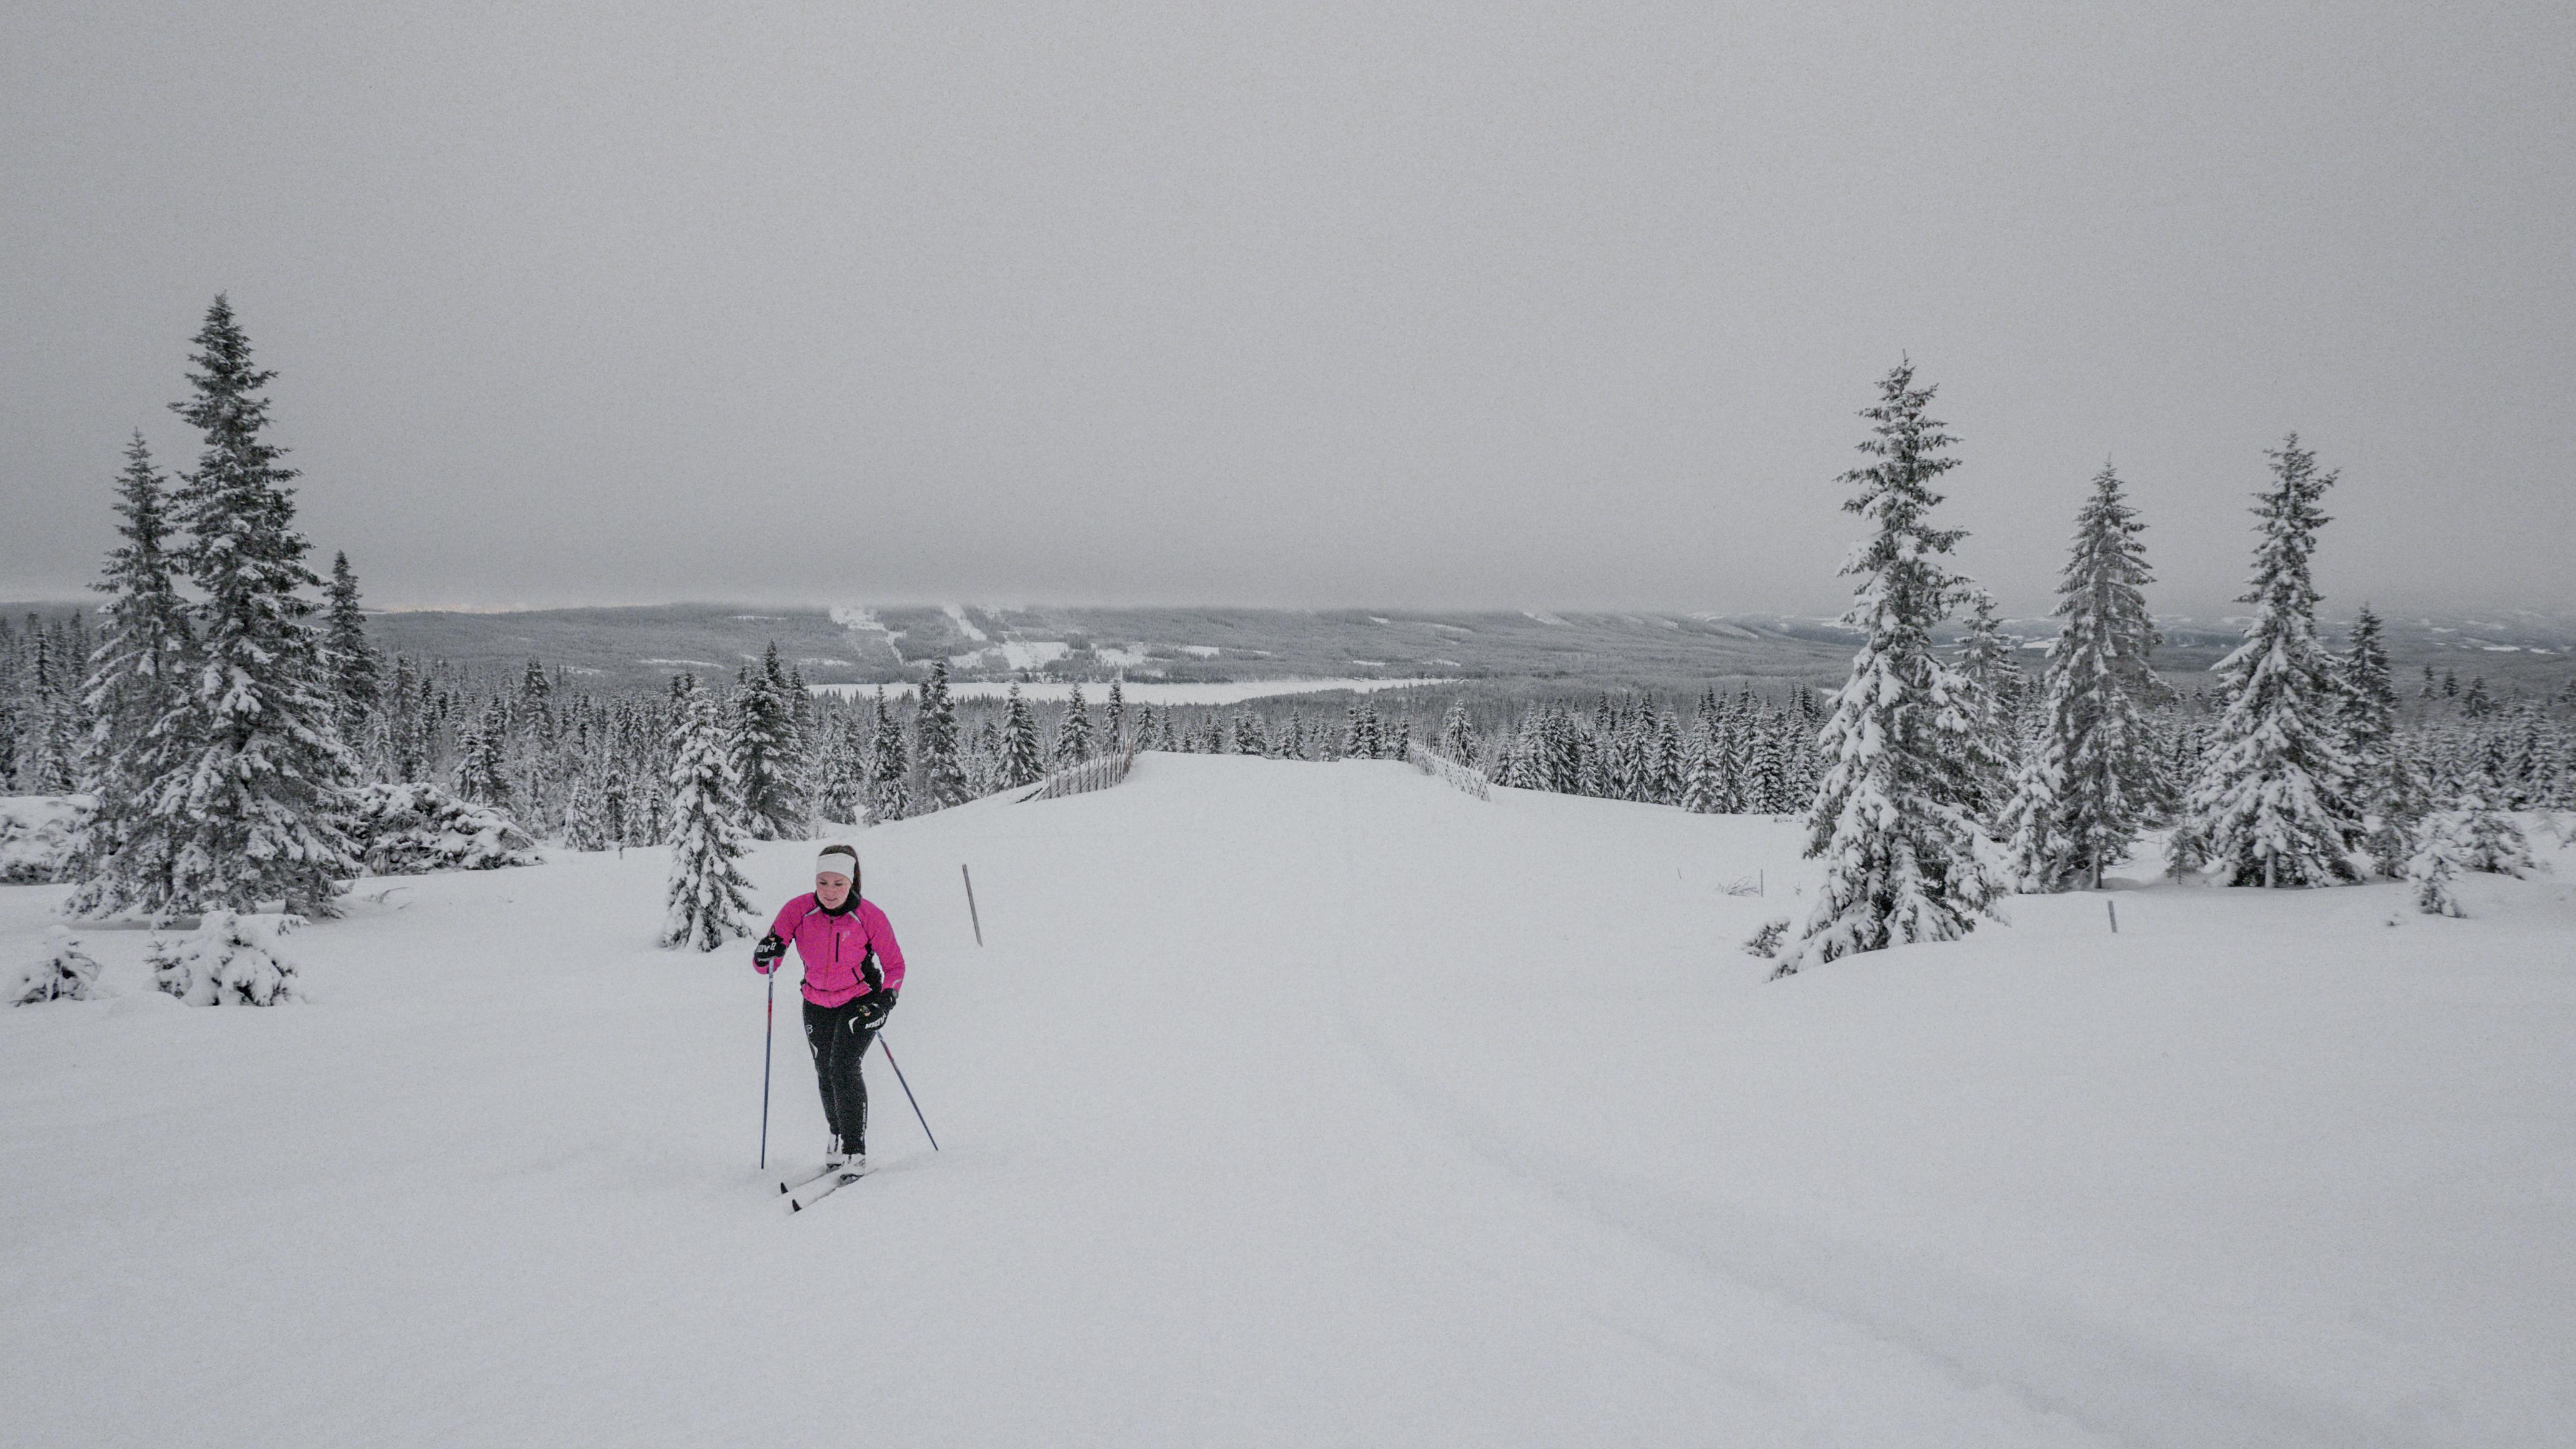 Single Lillehammer medlemmer interessert i sukker pappa dating, Sugar Baby Norge